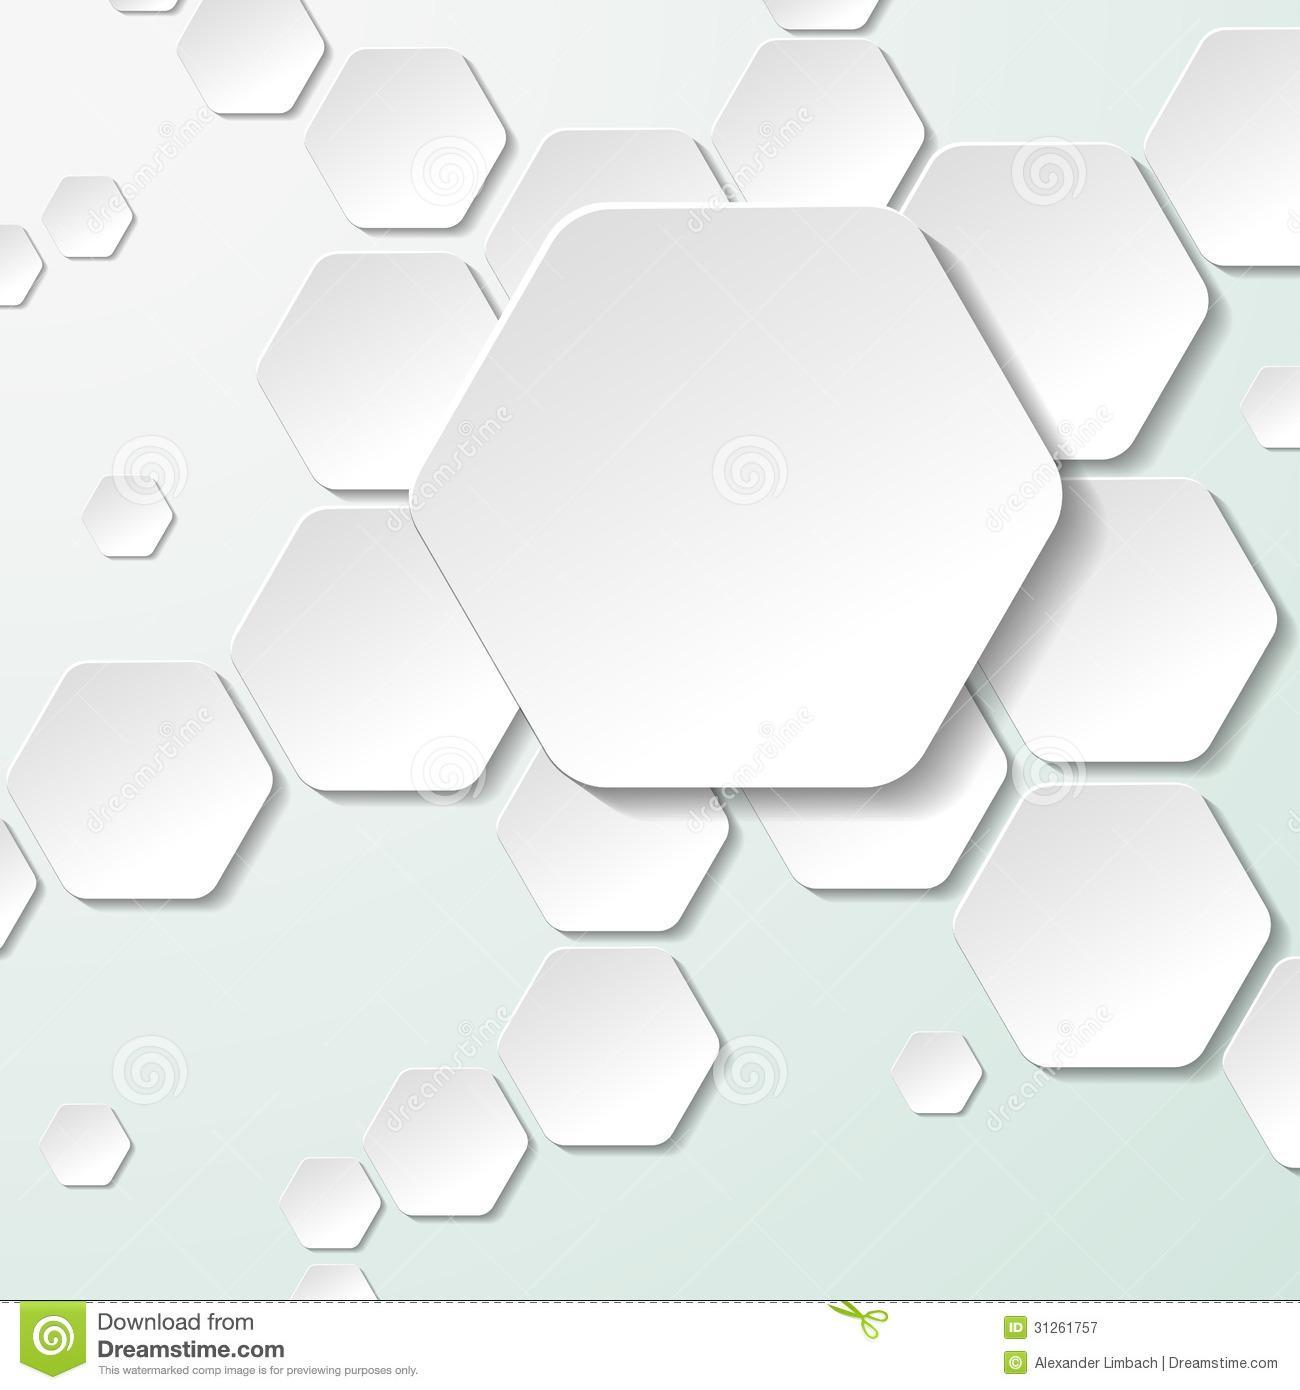 Freezer Paper Hexagon Templates